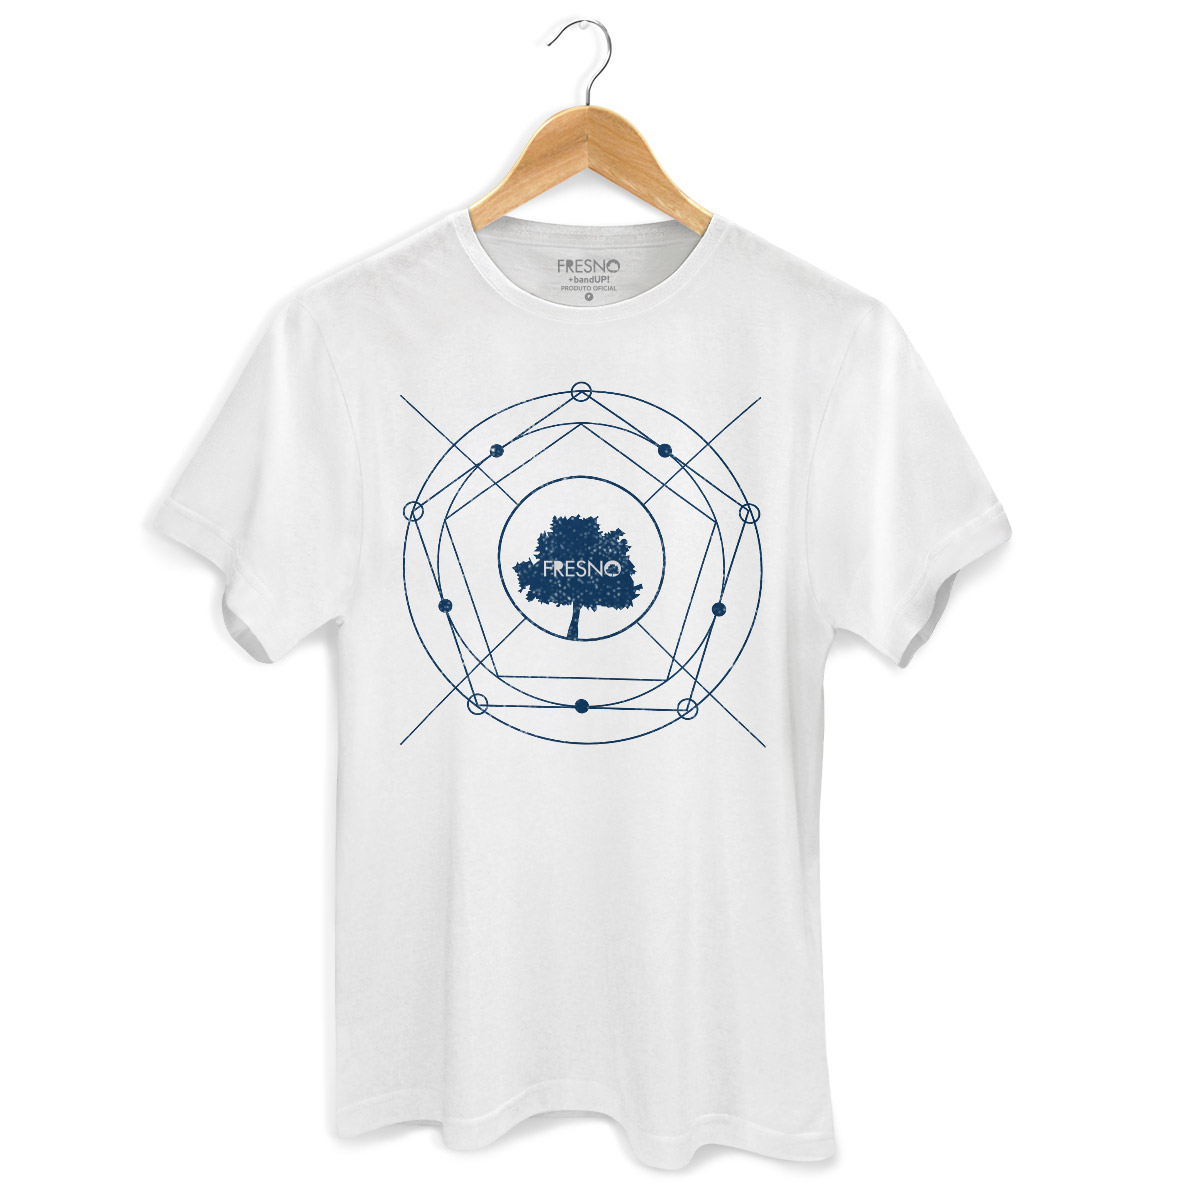 Camiseta Masculina Fresno Árvore Diagrama